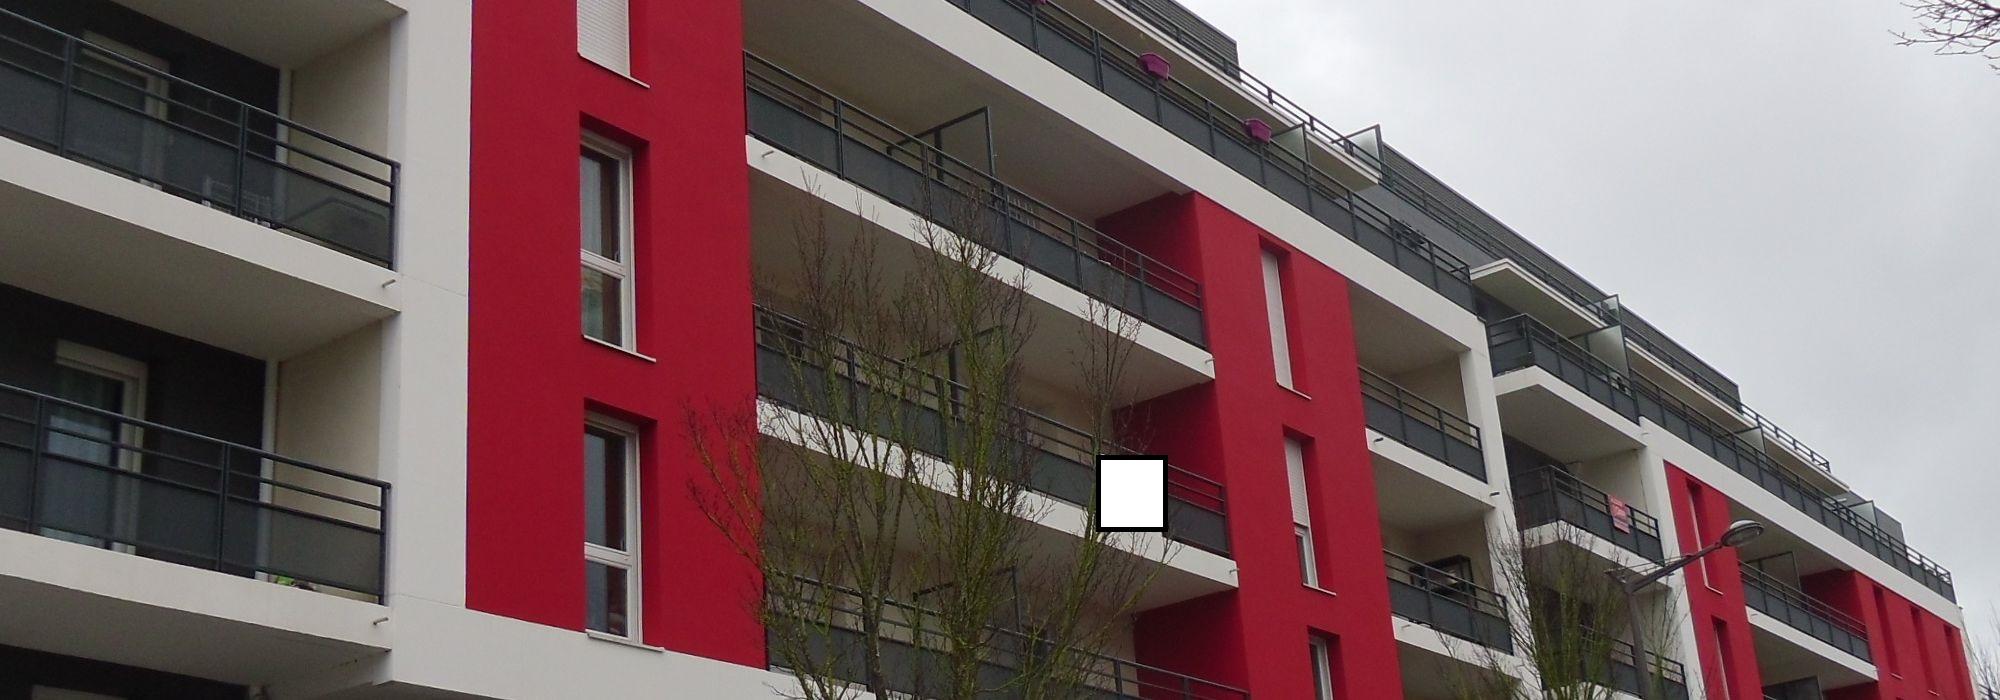 TOURS MAGINOT – F1bis dernier étage avec TERRASSE